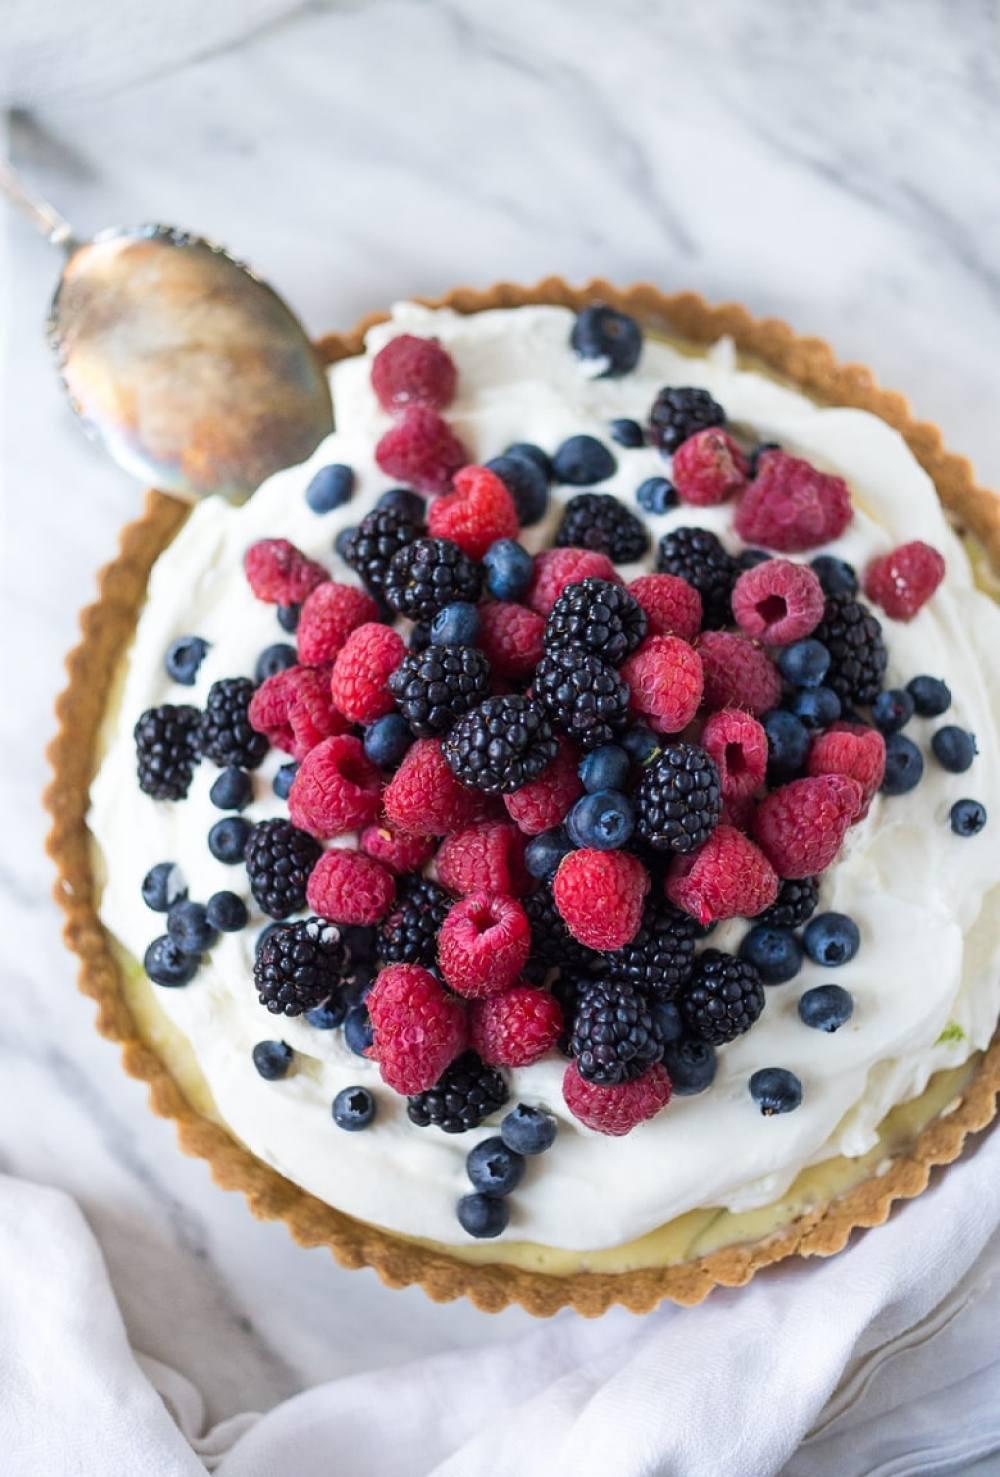 Summer Berry Tart with Shortbread Crust